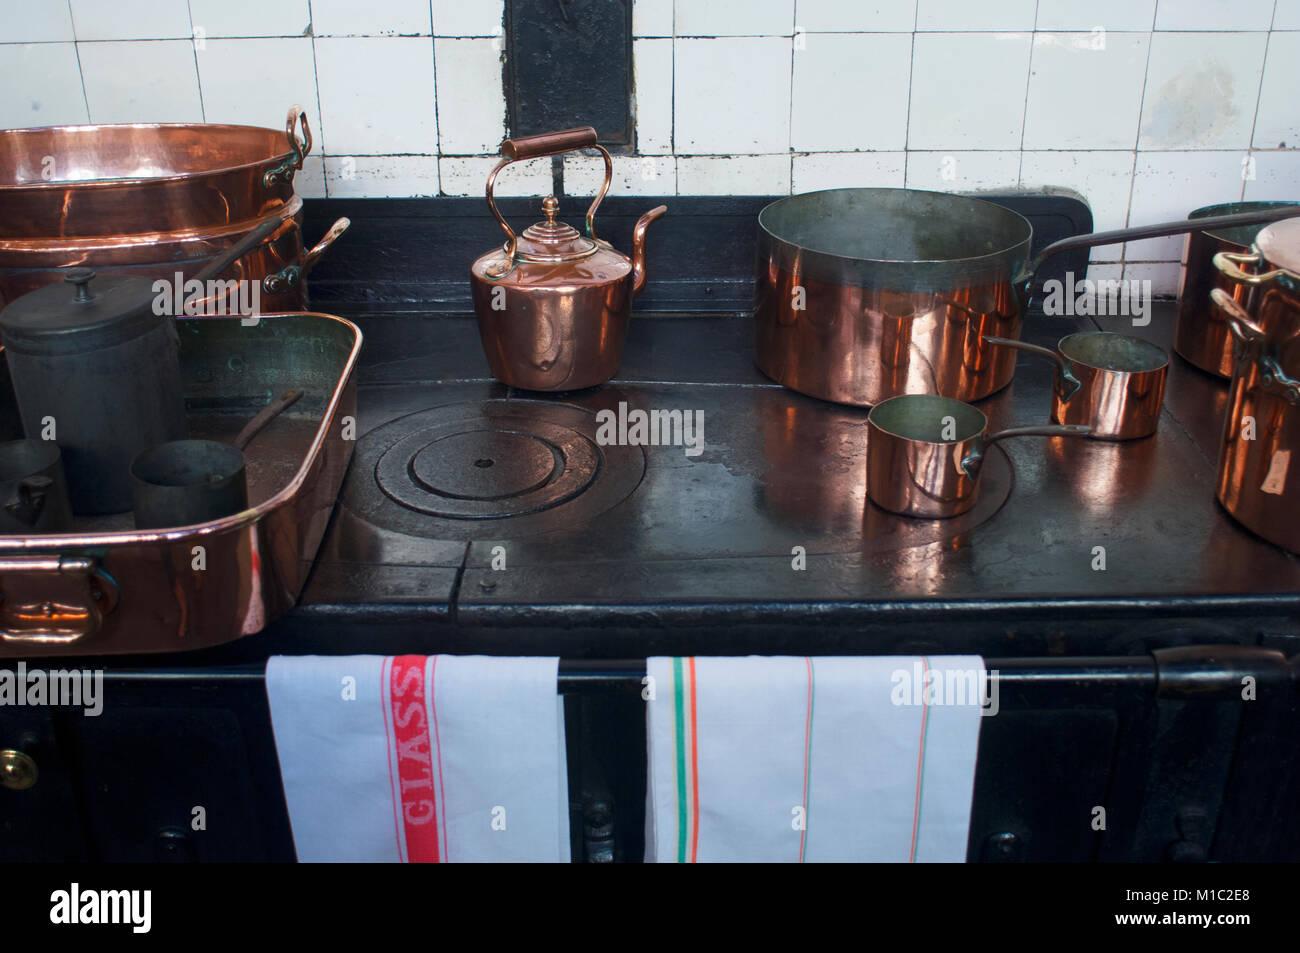 Pots Pans Vintage Stockfotos & Pots Pans Vintage Bilder - Alamy